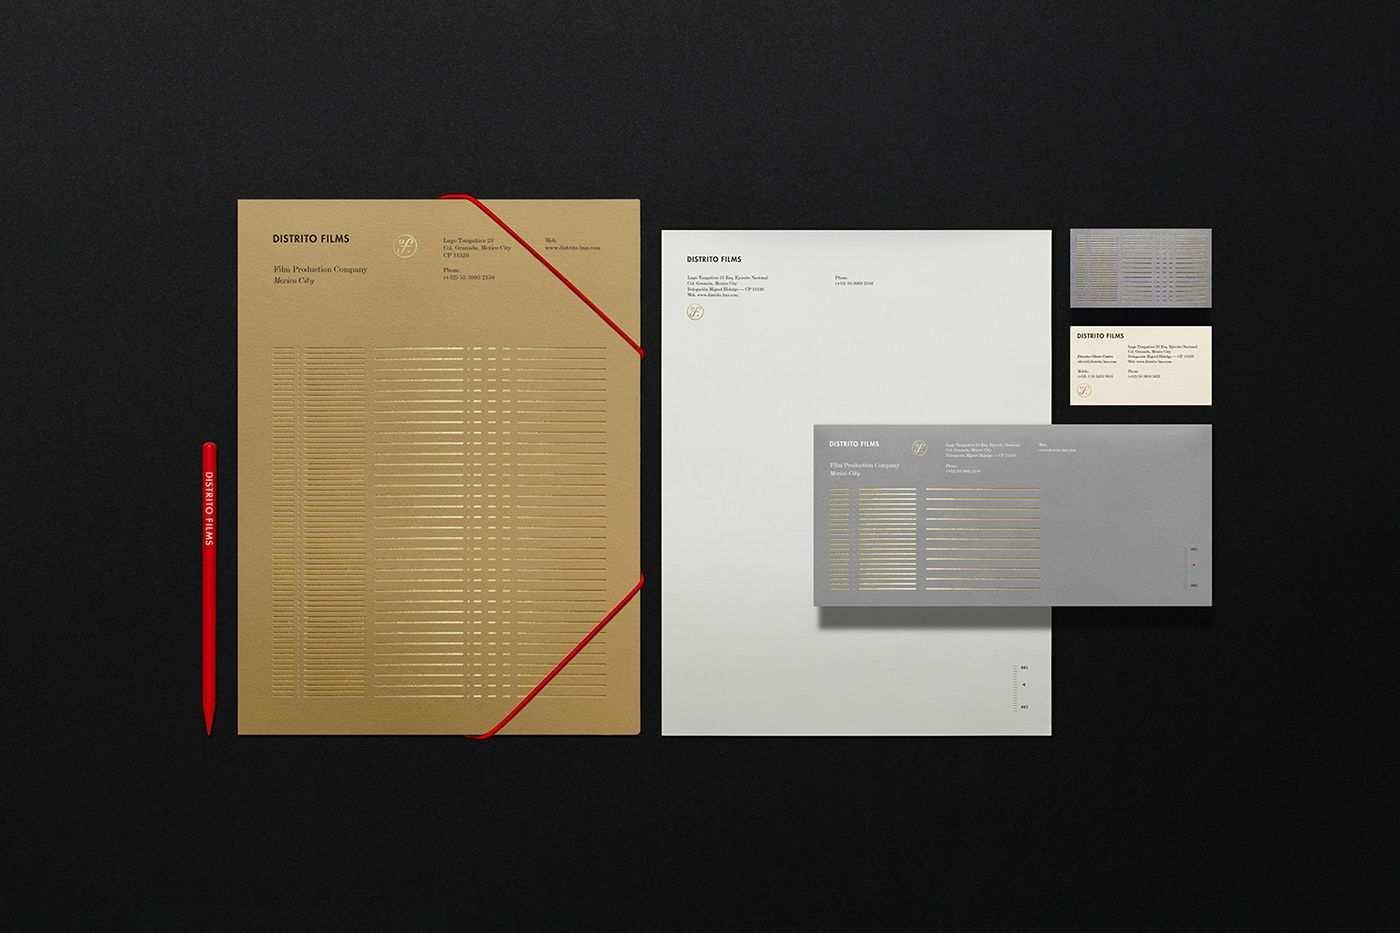 Distrito Films On Behance Unternehmensbroschure Unternehmensbroschure Design Corporate Design